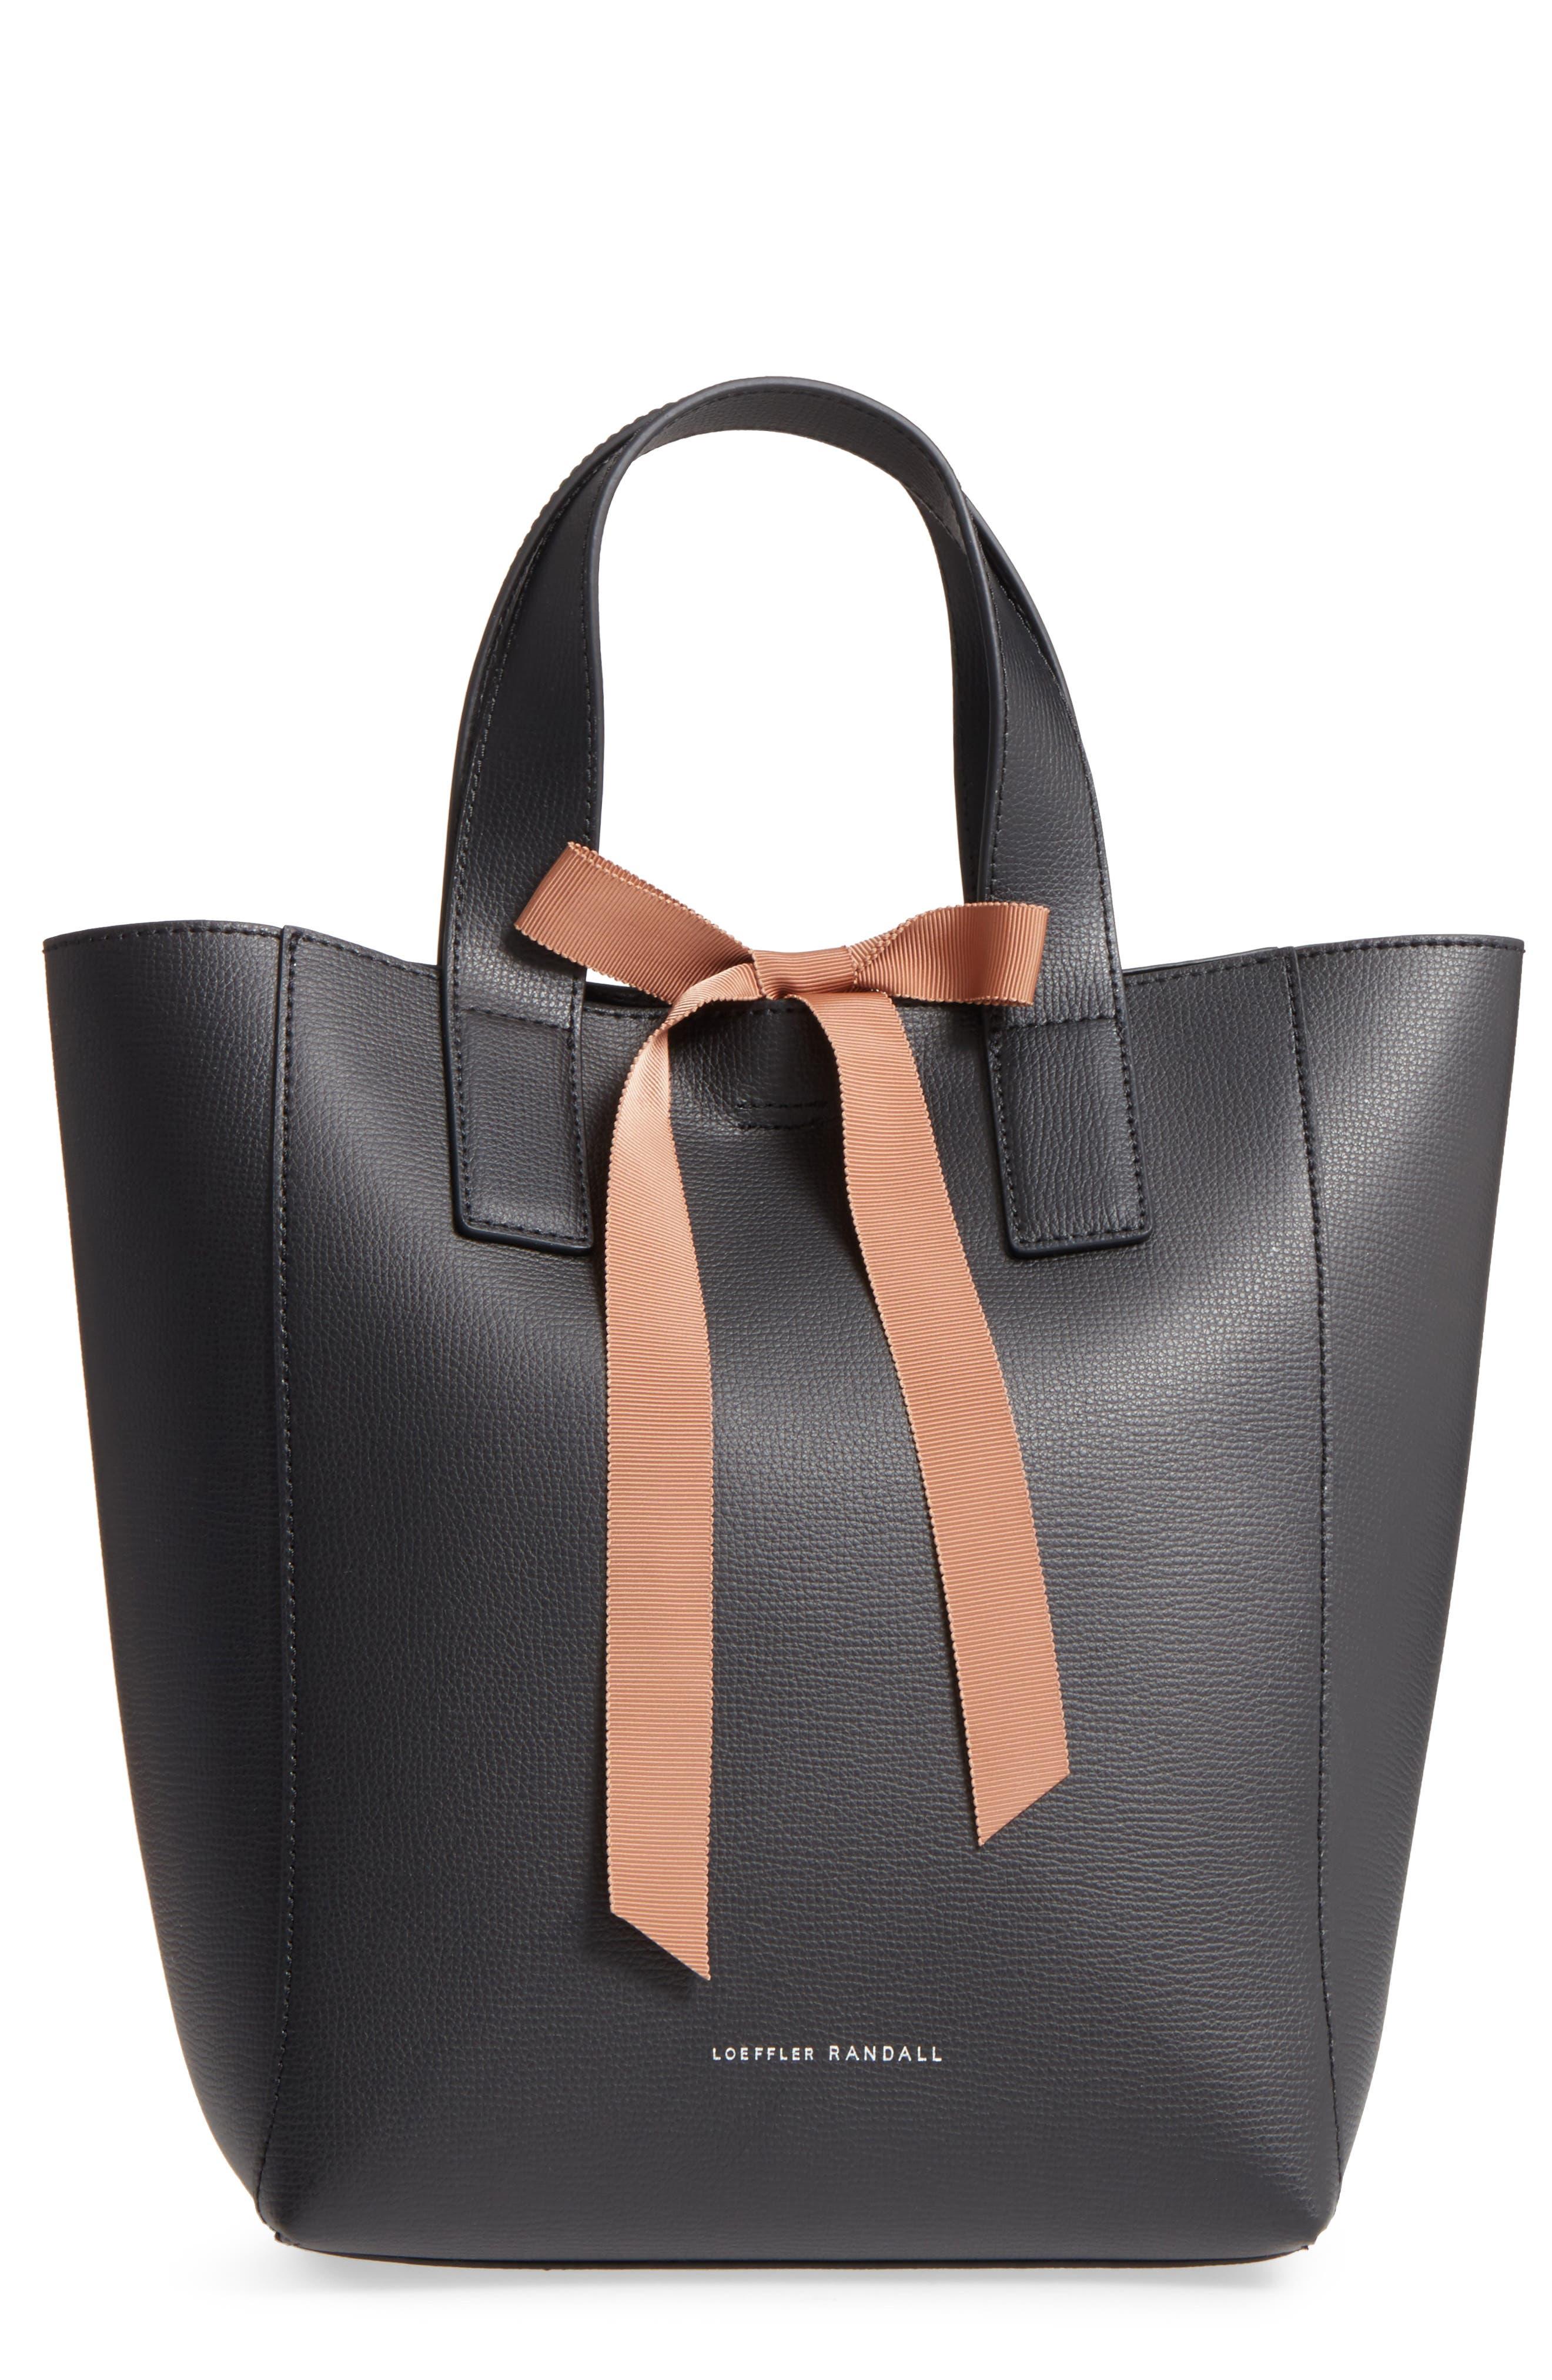 Alternate Image 1 Selected - Loeffler Randall Ribbon Tie Leather Top Handle Shopper